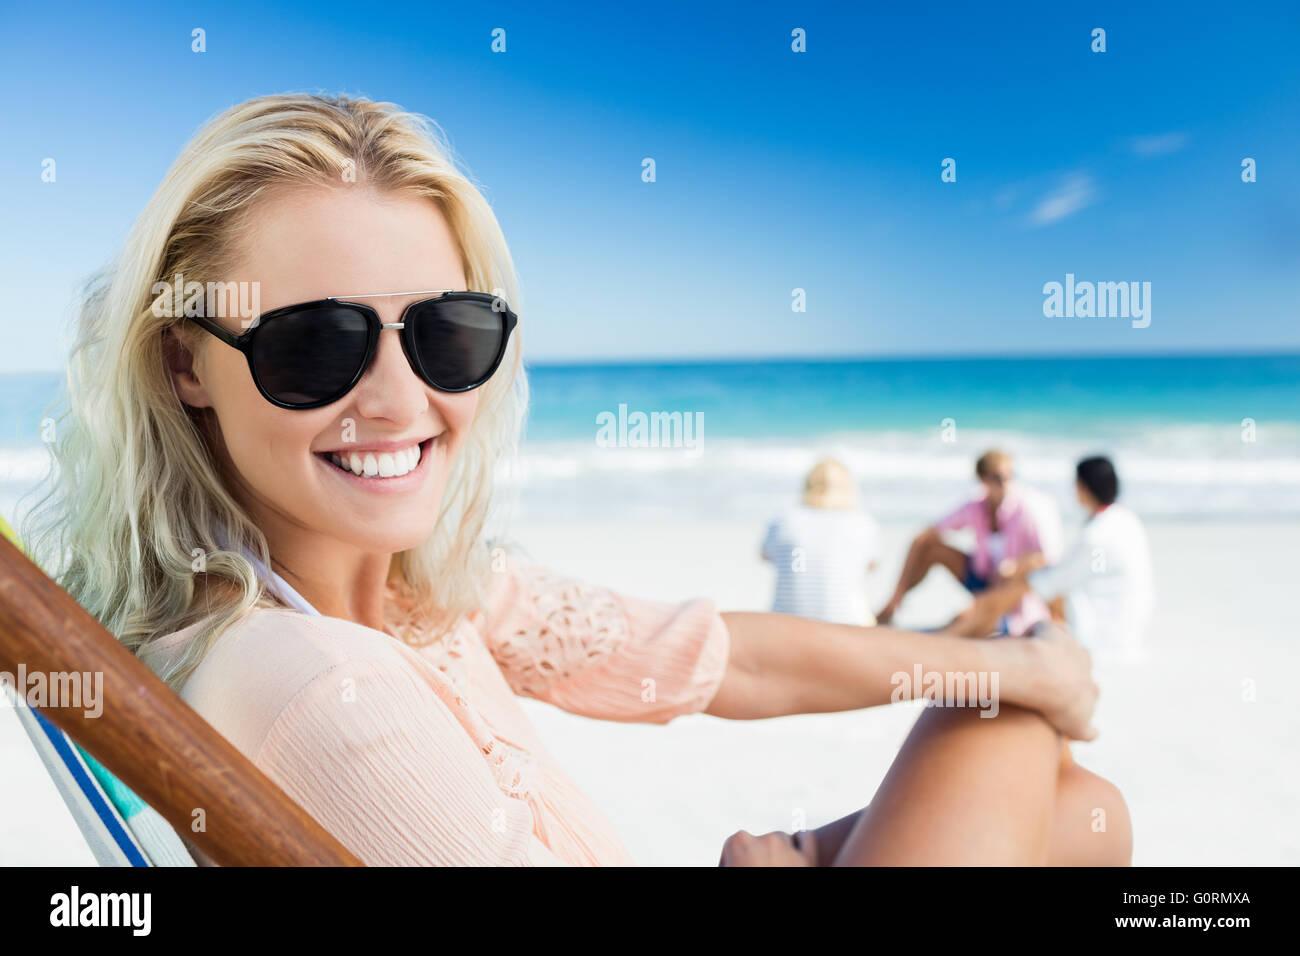 Woman lying on the beach - Stock Image